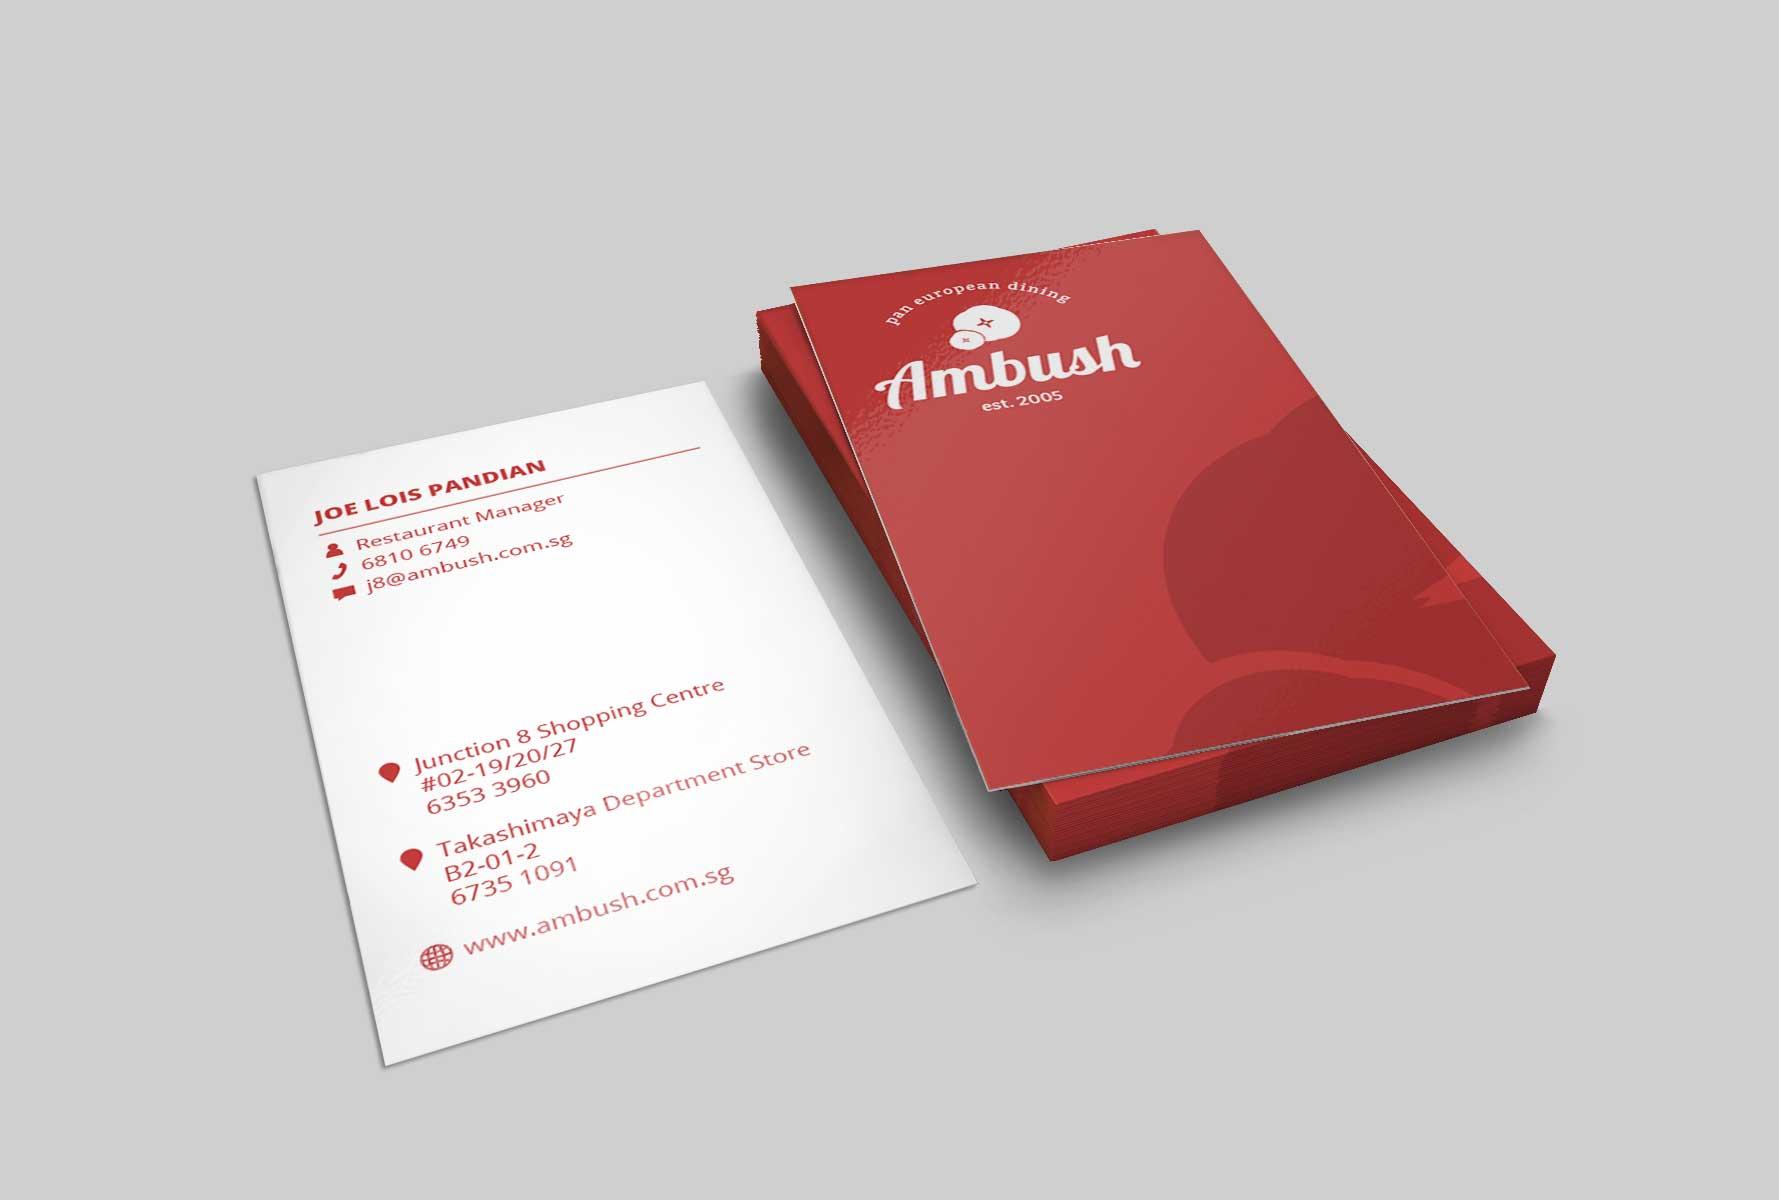 Ambush-Biz-Card-PREVIEW.jpg